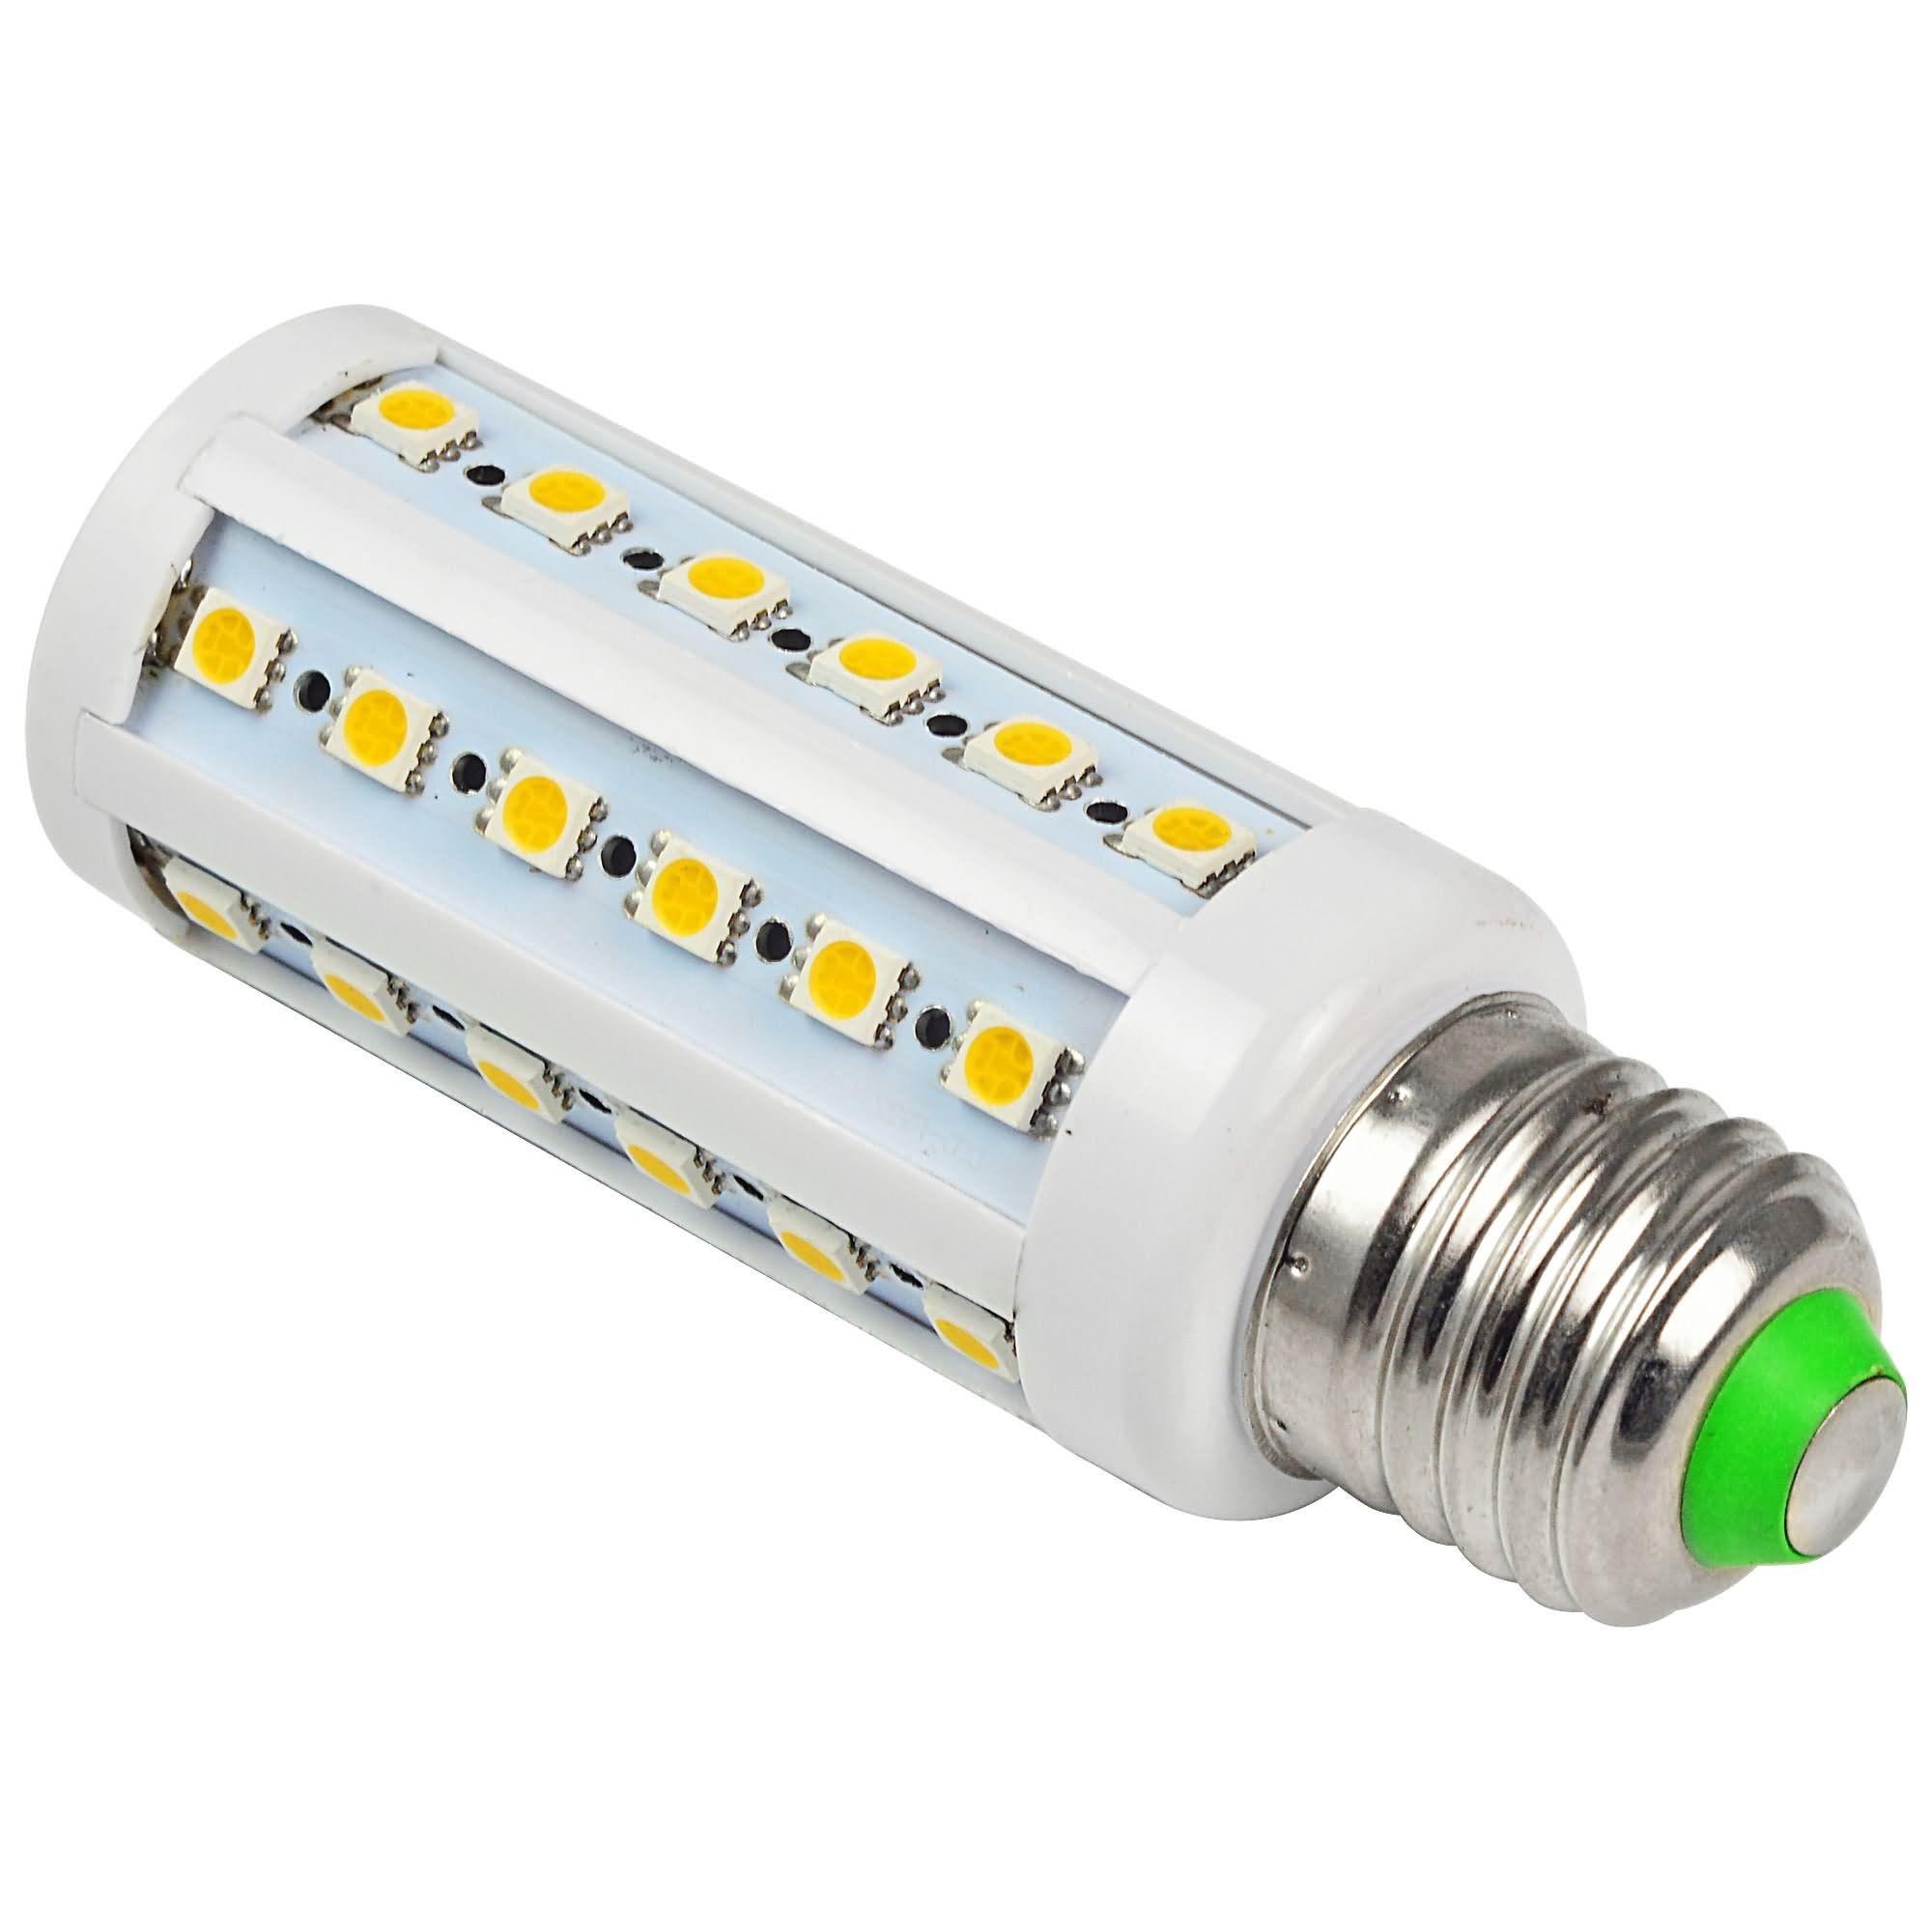 mengsled mengs e27 7w led corn light 42x 5050 smd leds led bulb in warm white cool white. Black Bedroom Furniture Sets. Home Design Ideas